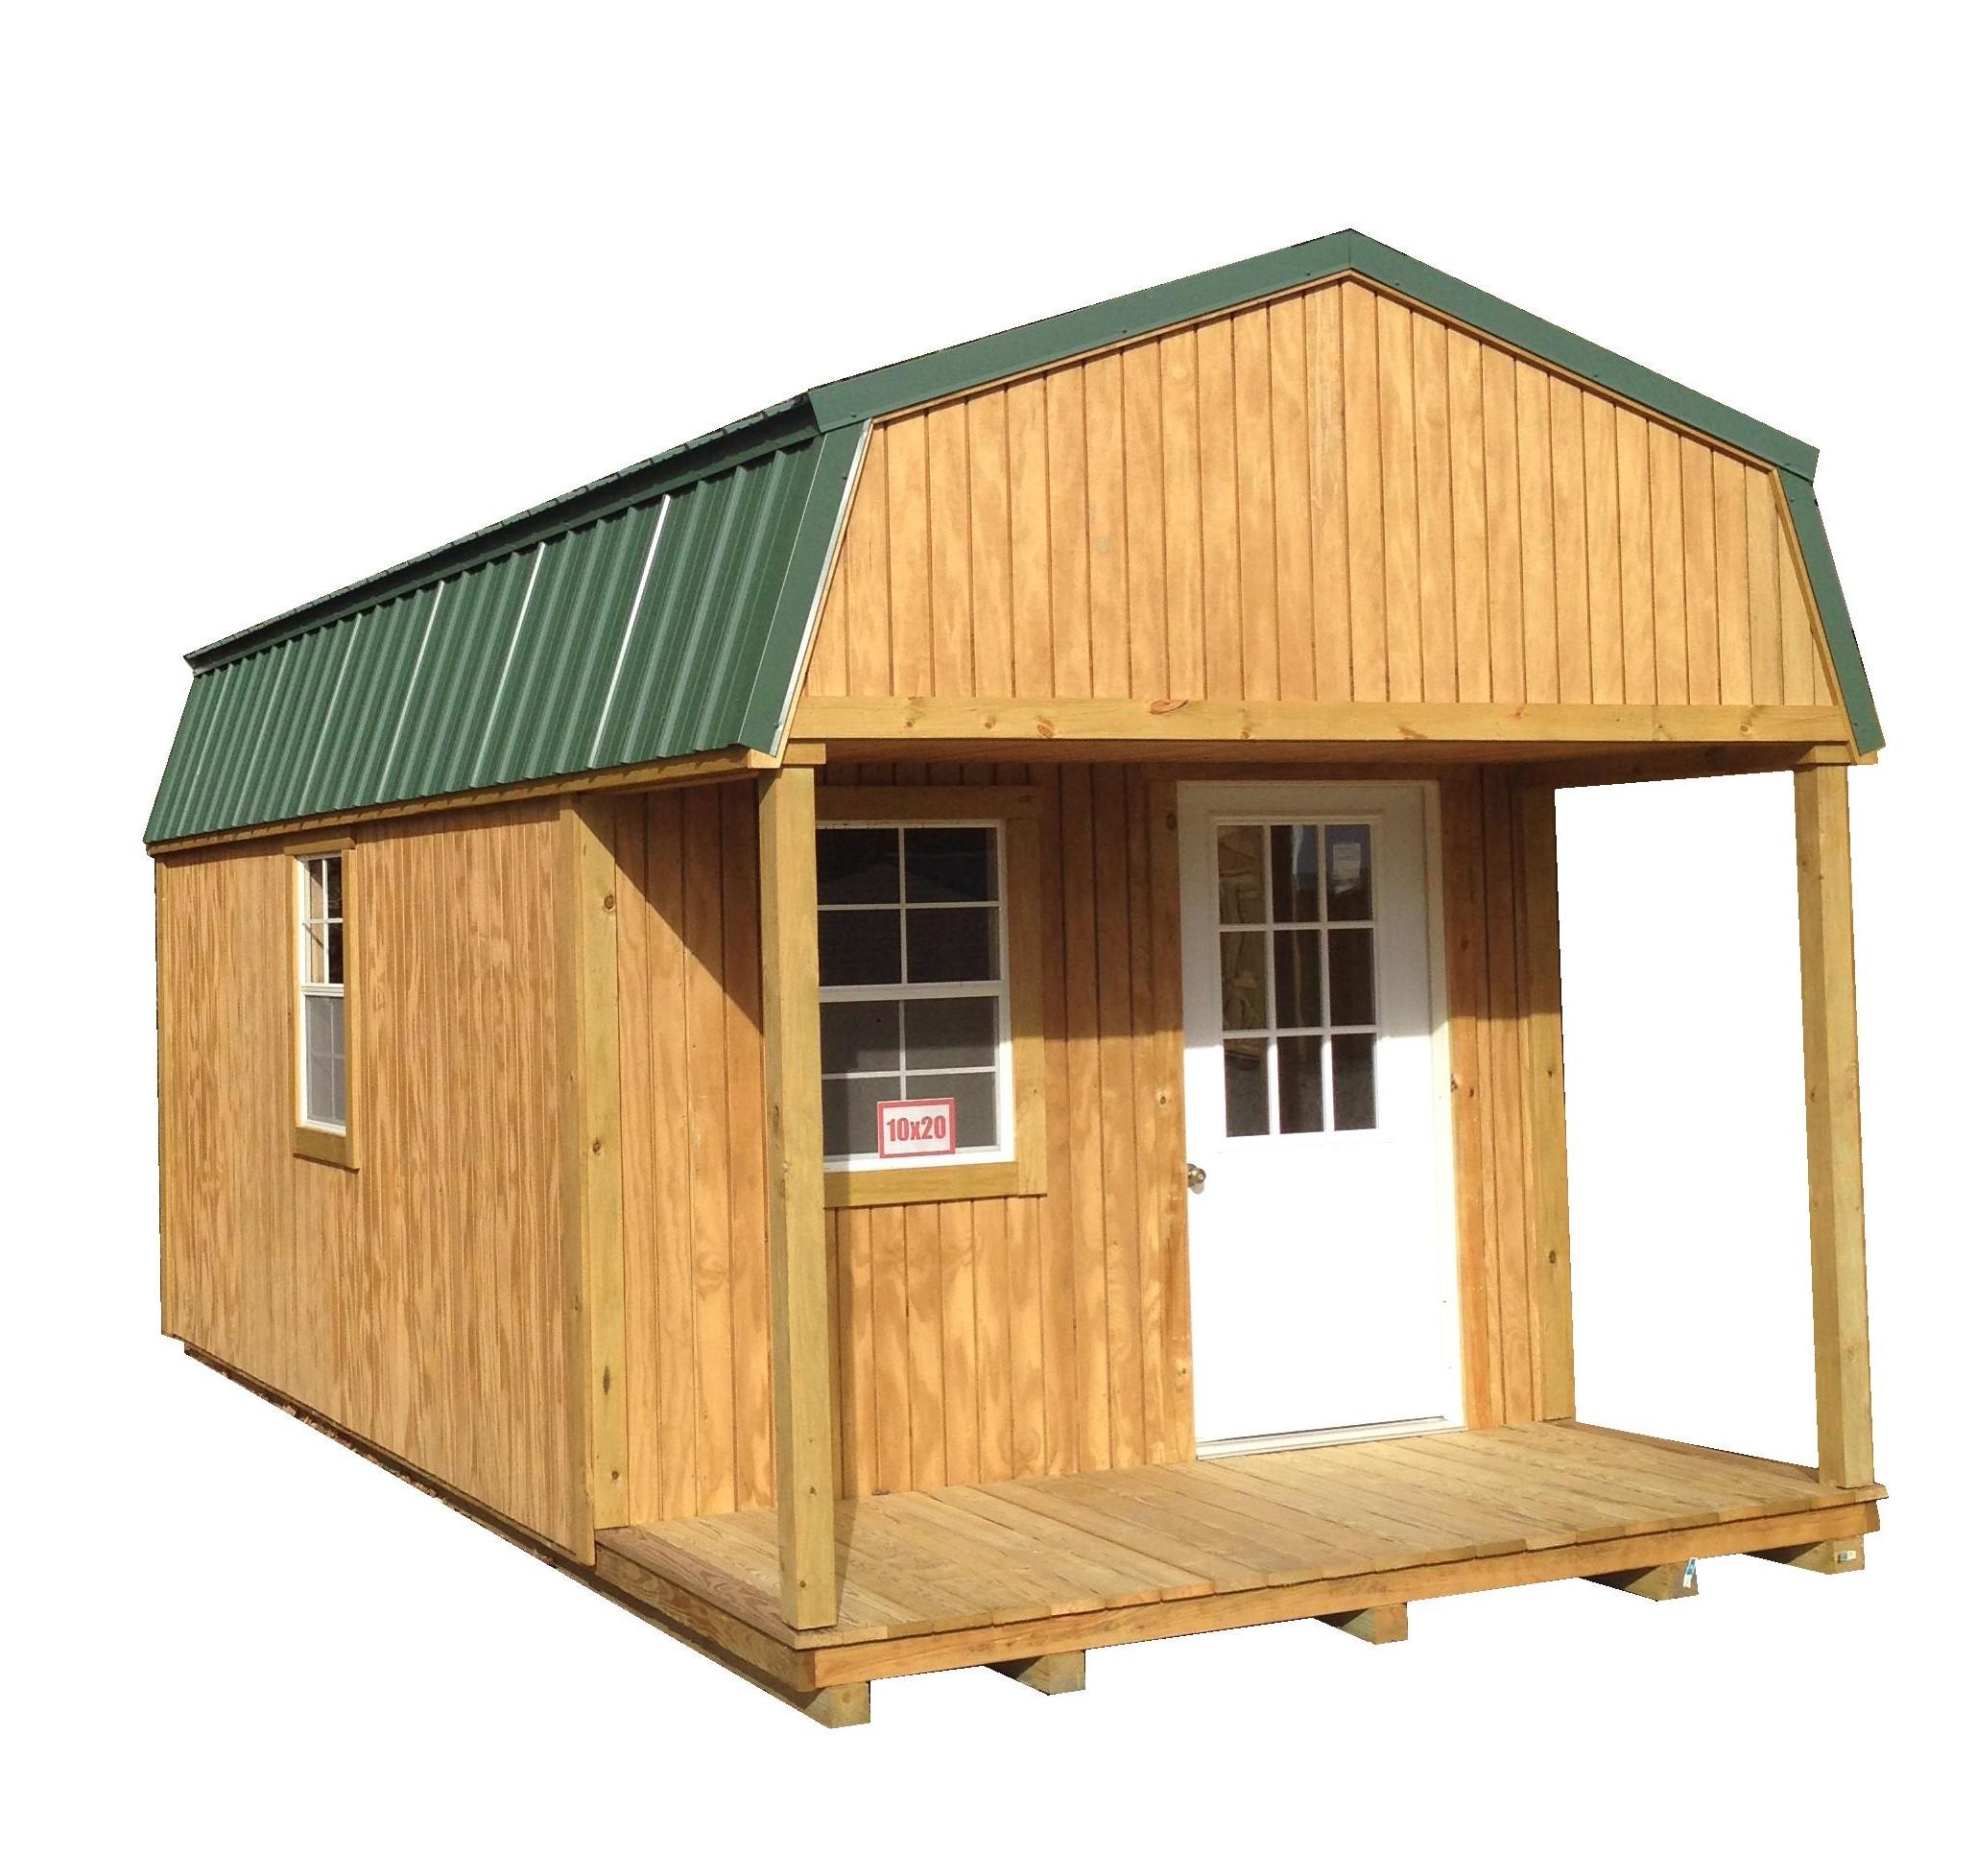 Modular Horse Barns, Sheds, Garages